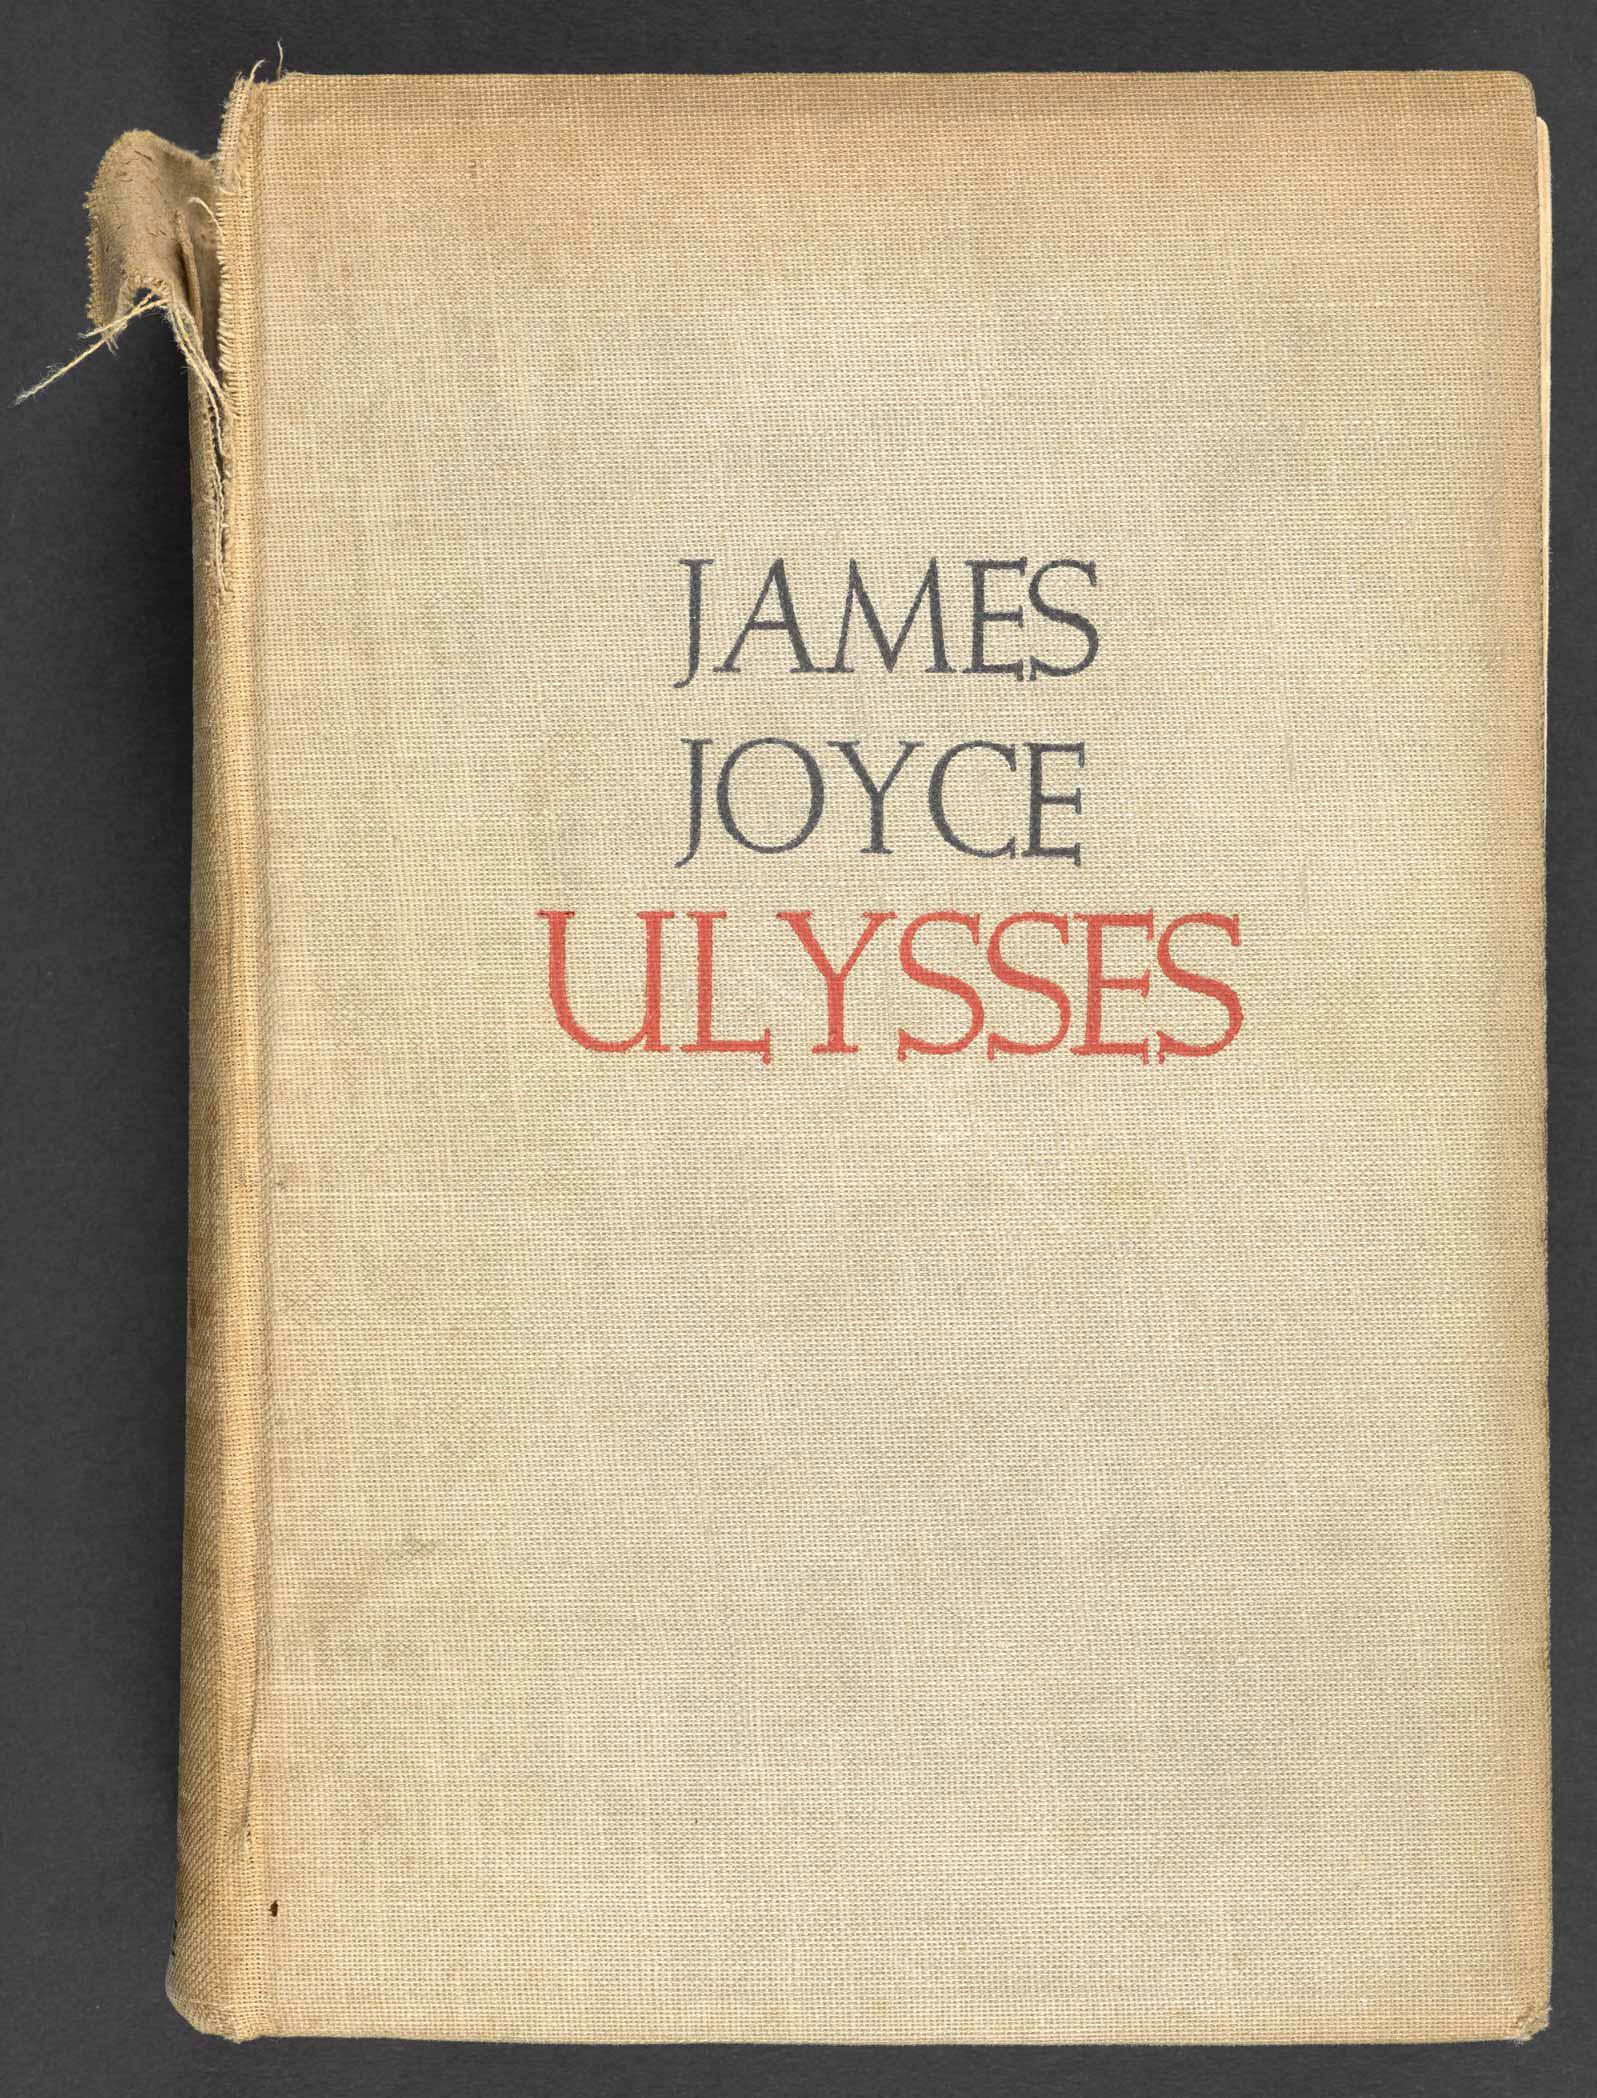 Ulysses by James Joyce, 1934 American edition